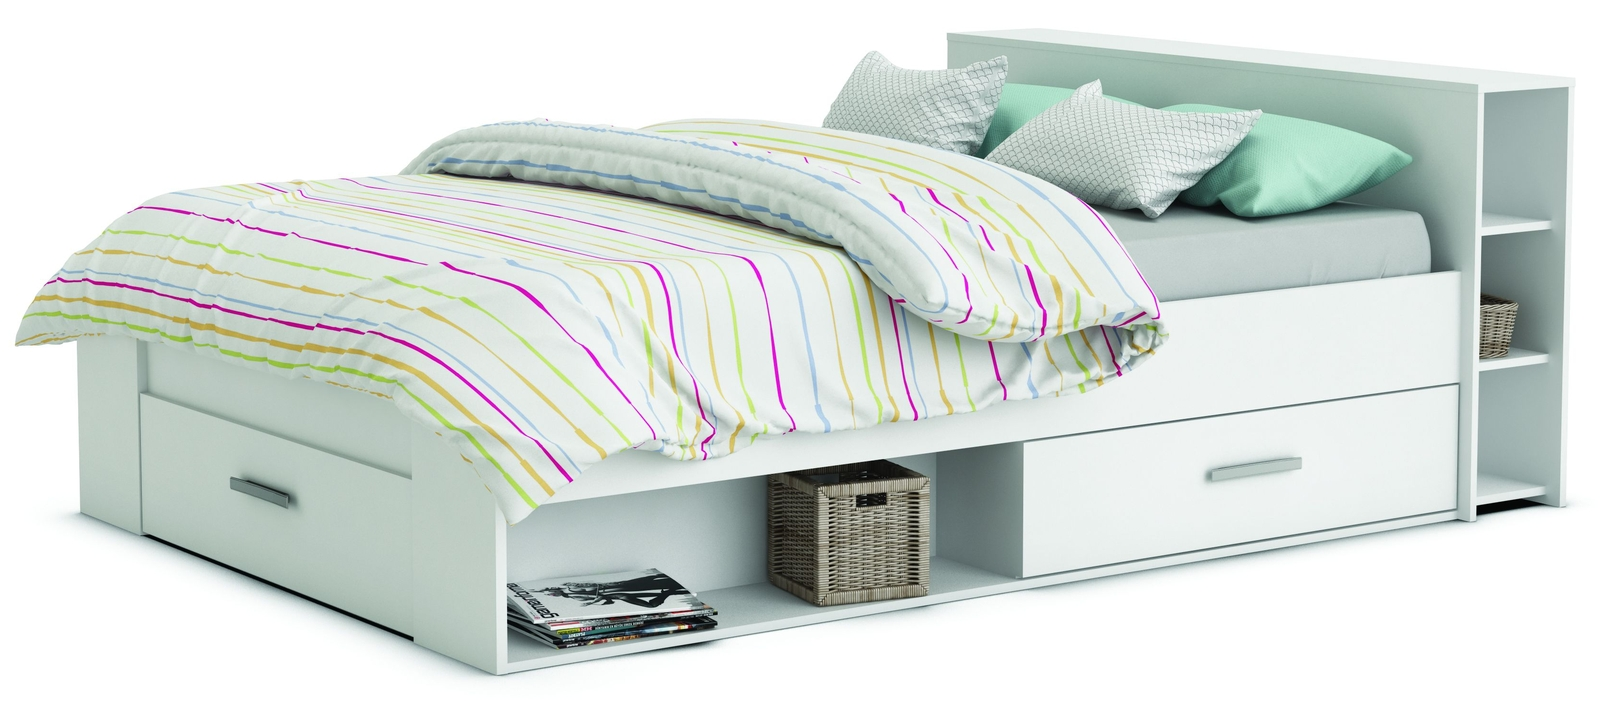 Manželská postel 140 cm - Tempo Kondela - Roket 159574 bílá